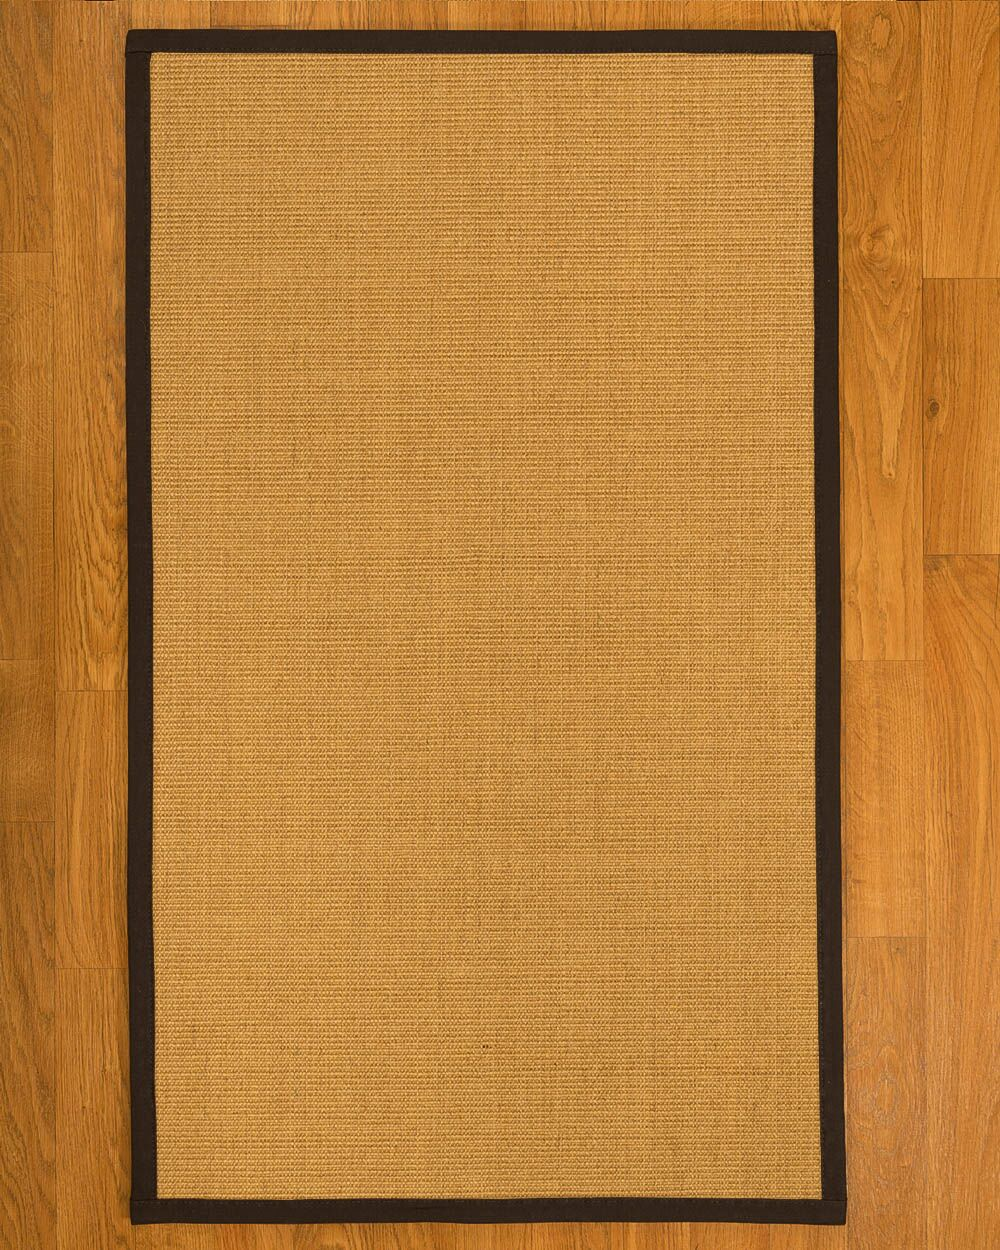 Astley Hand Woven Fiber Sisal Brown/Fudge Area Rug Rug Size: Runner 2'6